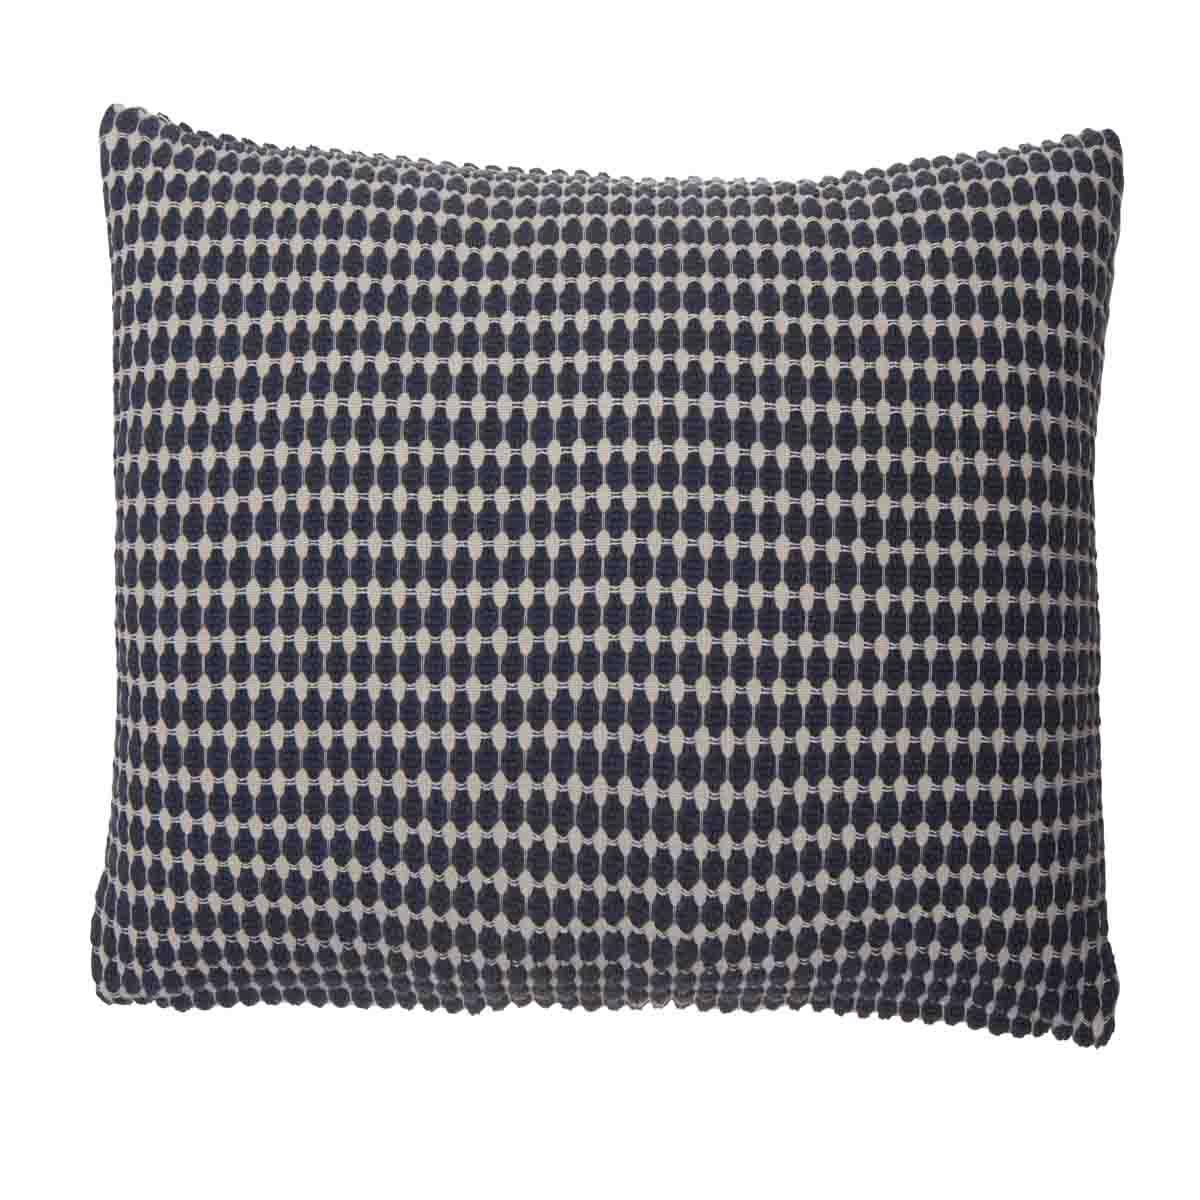 Coussin style bohème gipsy en coton 50 x 50 cm Lino